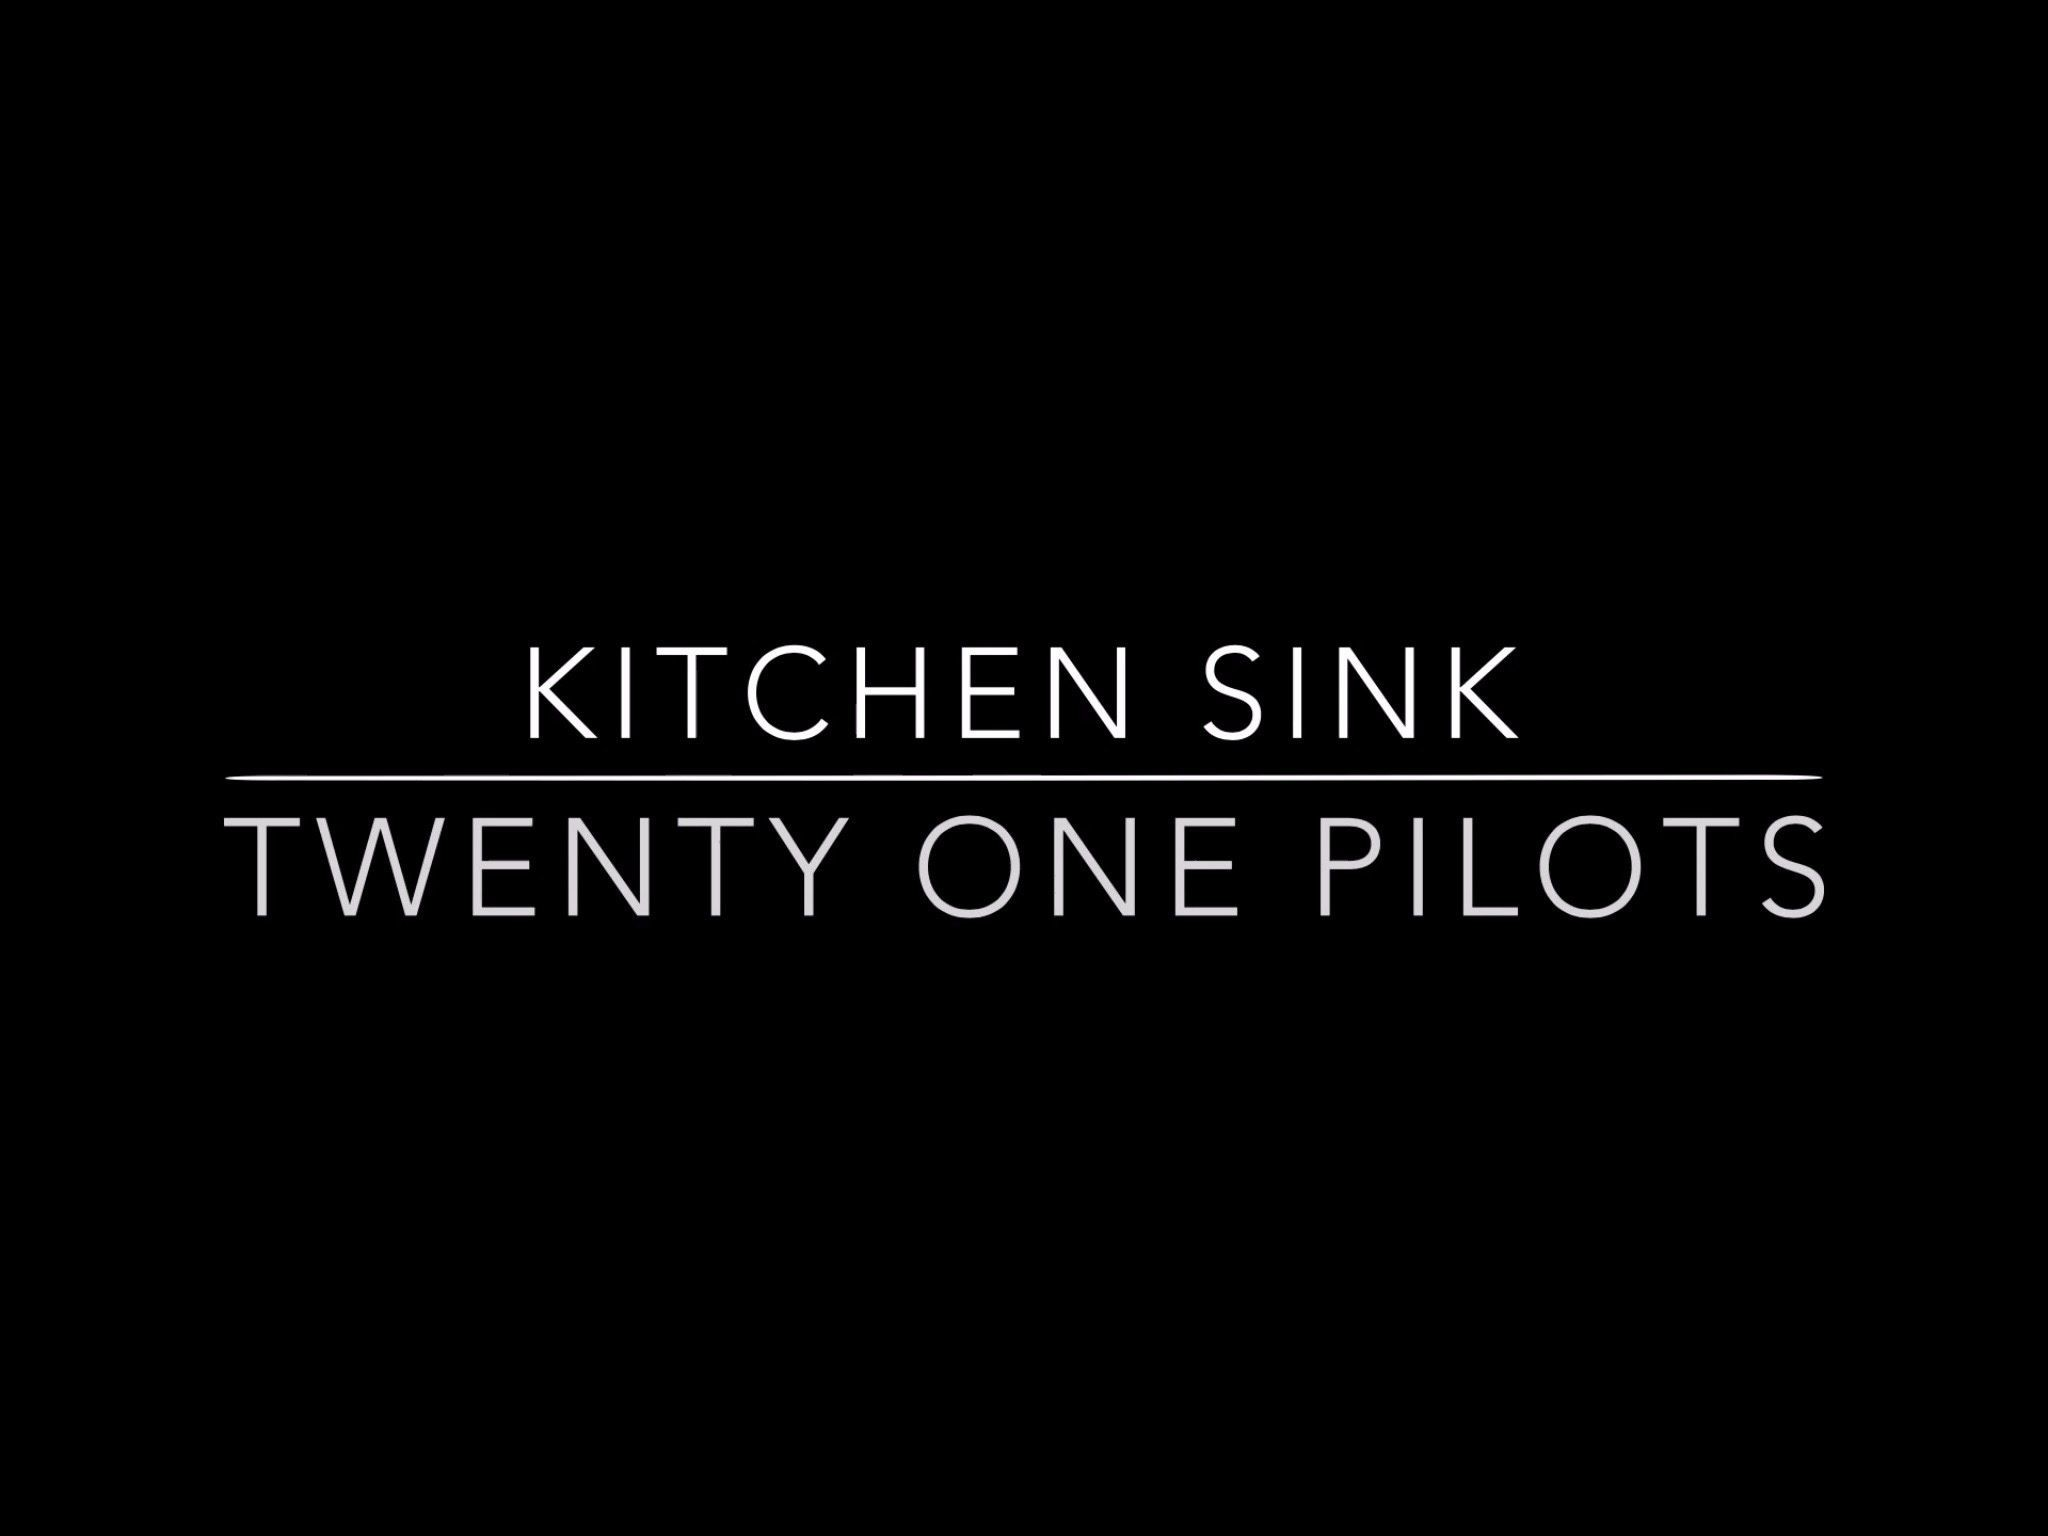 Twenty One Pilots Lyrics Wallpaper (89+ images)